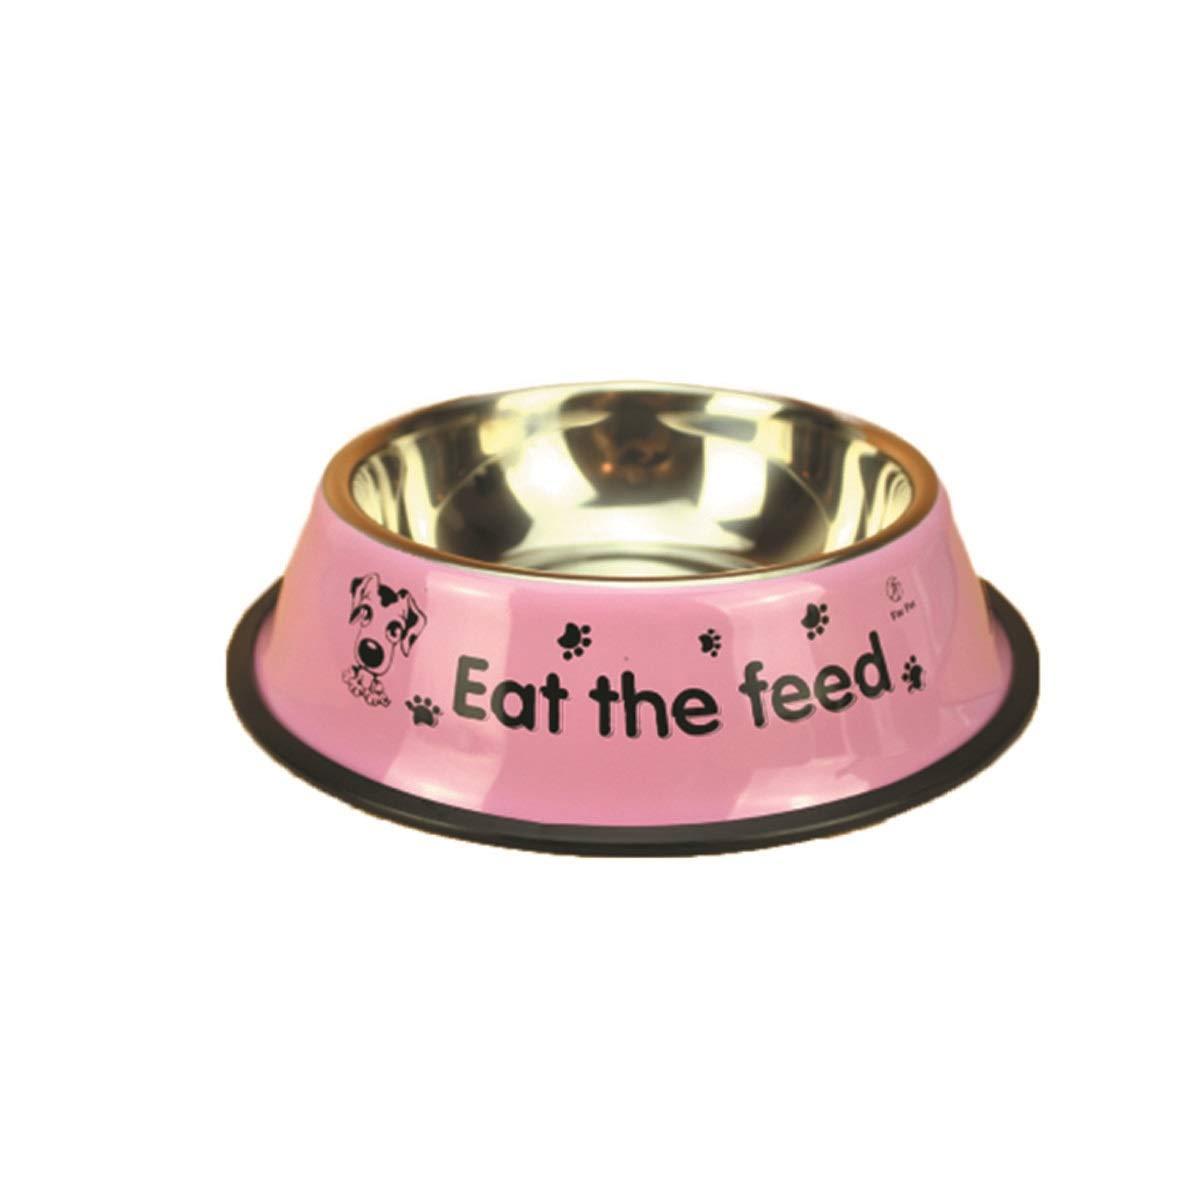 Haoyushangmao Cat Bowl, Dog Bowl, Dog Feeder, Q Cat Bowl Vivipet Oblique Mouth Flat Face Cat Pet Cat Bowl Food Bowl Water Bowl Cat Food Eat Ceramic Rice Bowl Latest Models (color   Pink, Size   M)